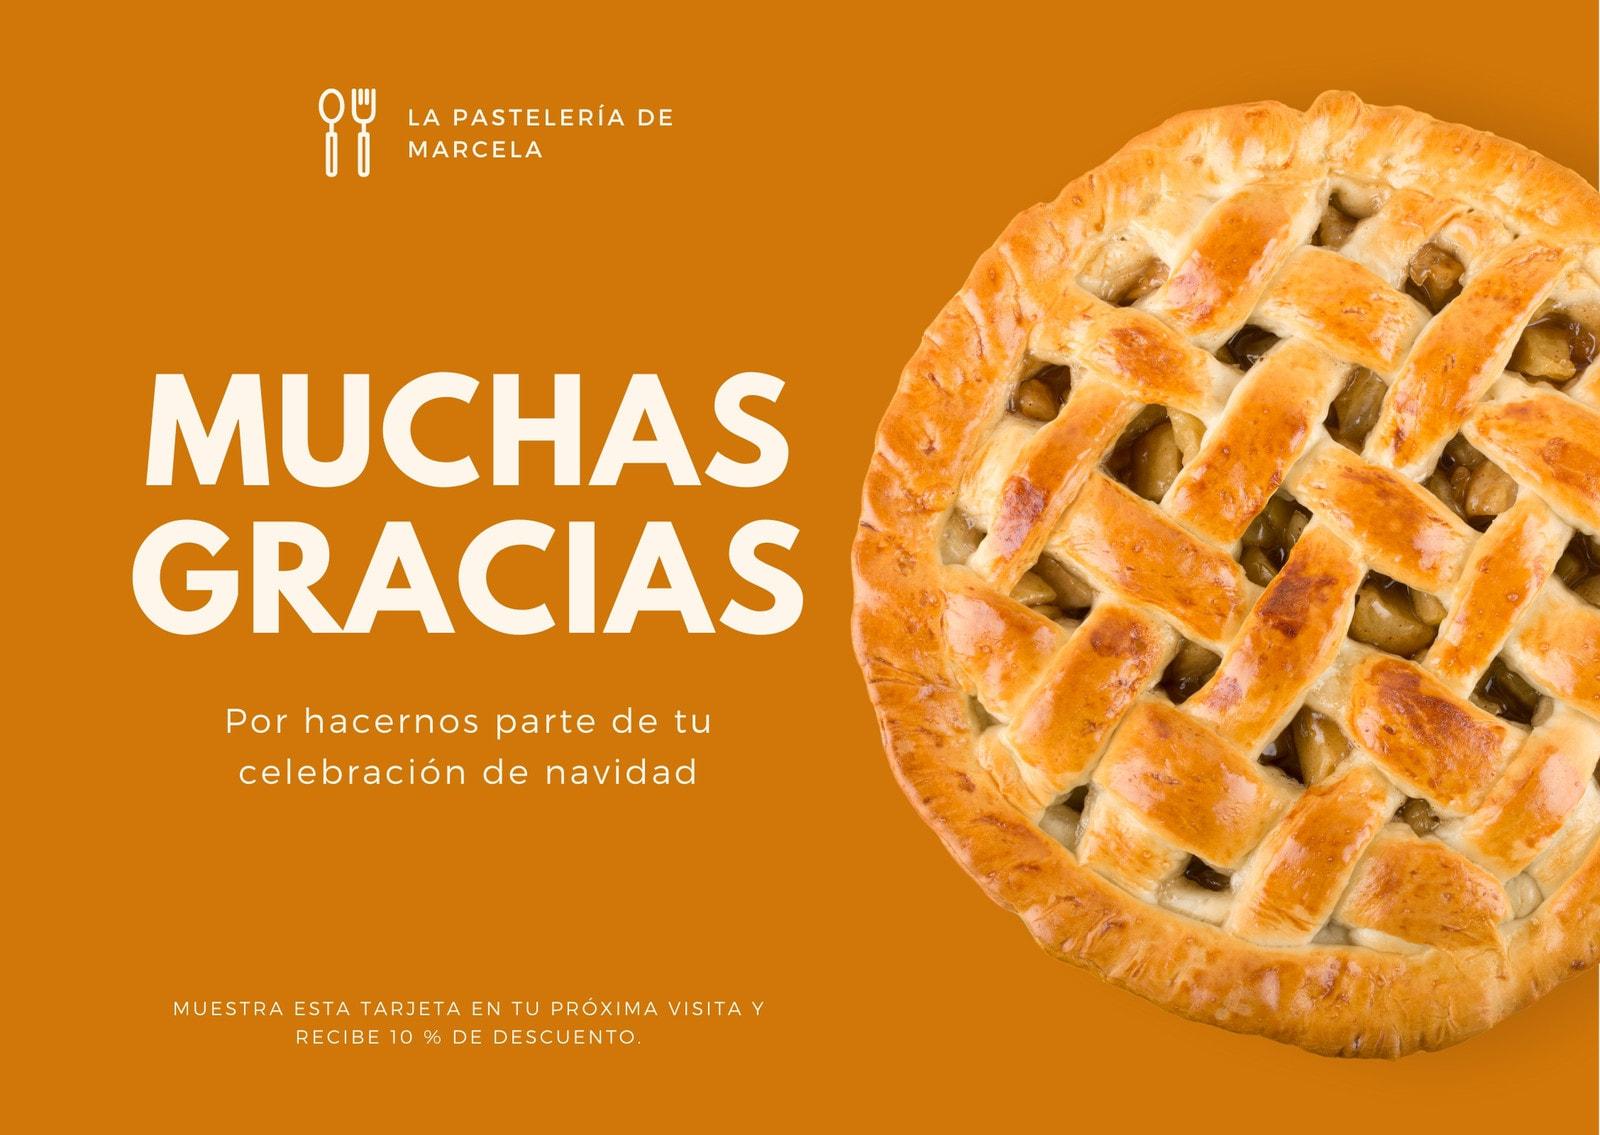 Acción de Gracias Pay Panaderías Tarjeta